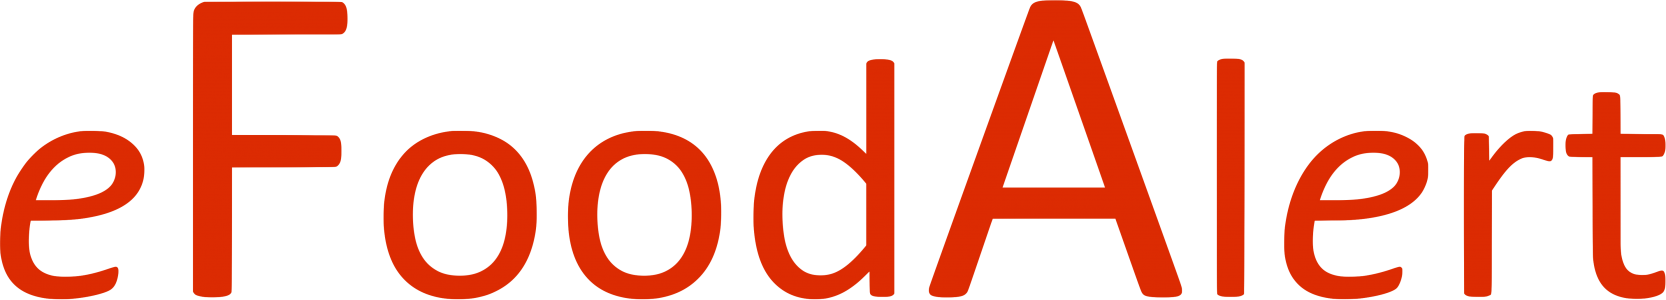 eFoodAlert